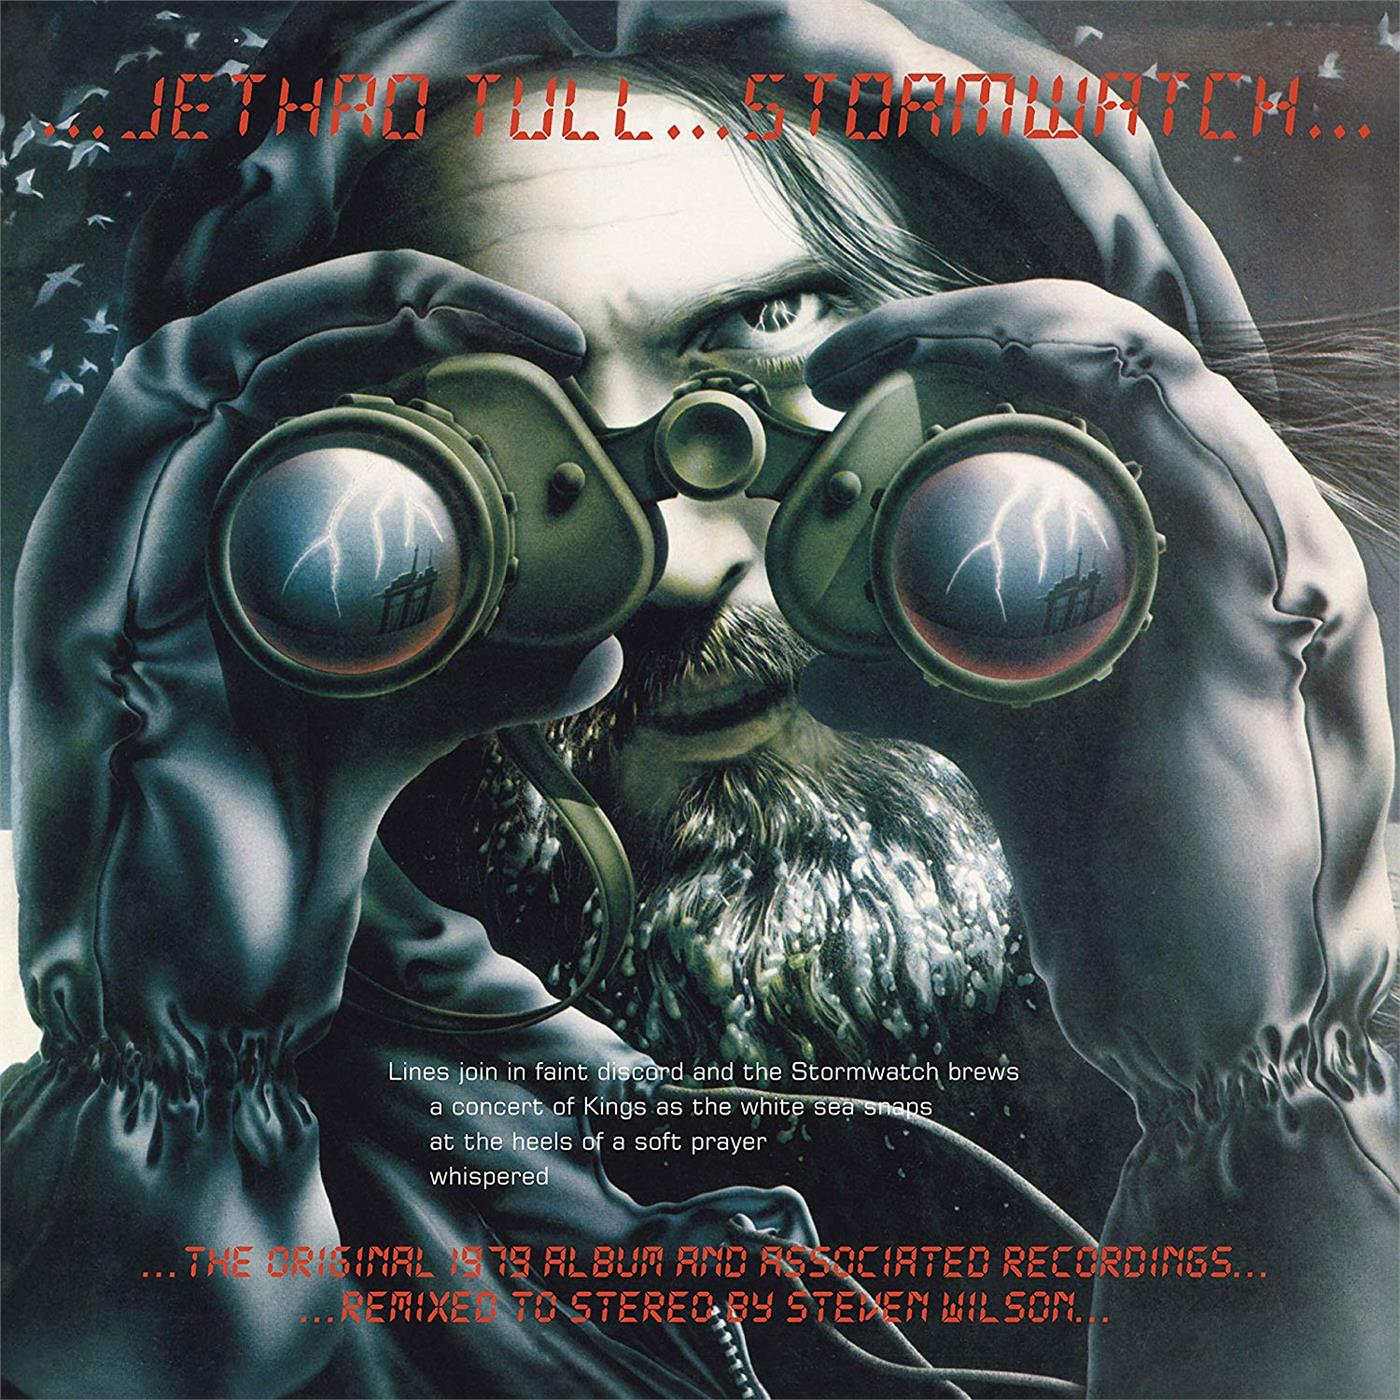 Stormwatch - Jethro Tull - Musik - PLG UK Catalog - 0190295400873 - 1/5-2020